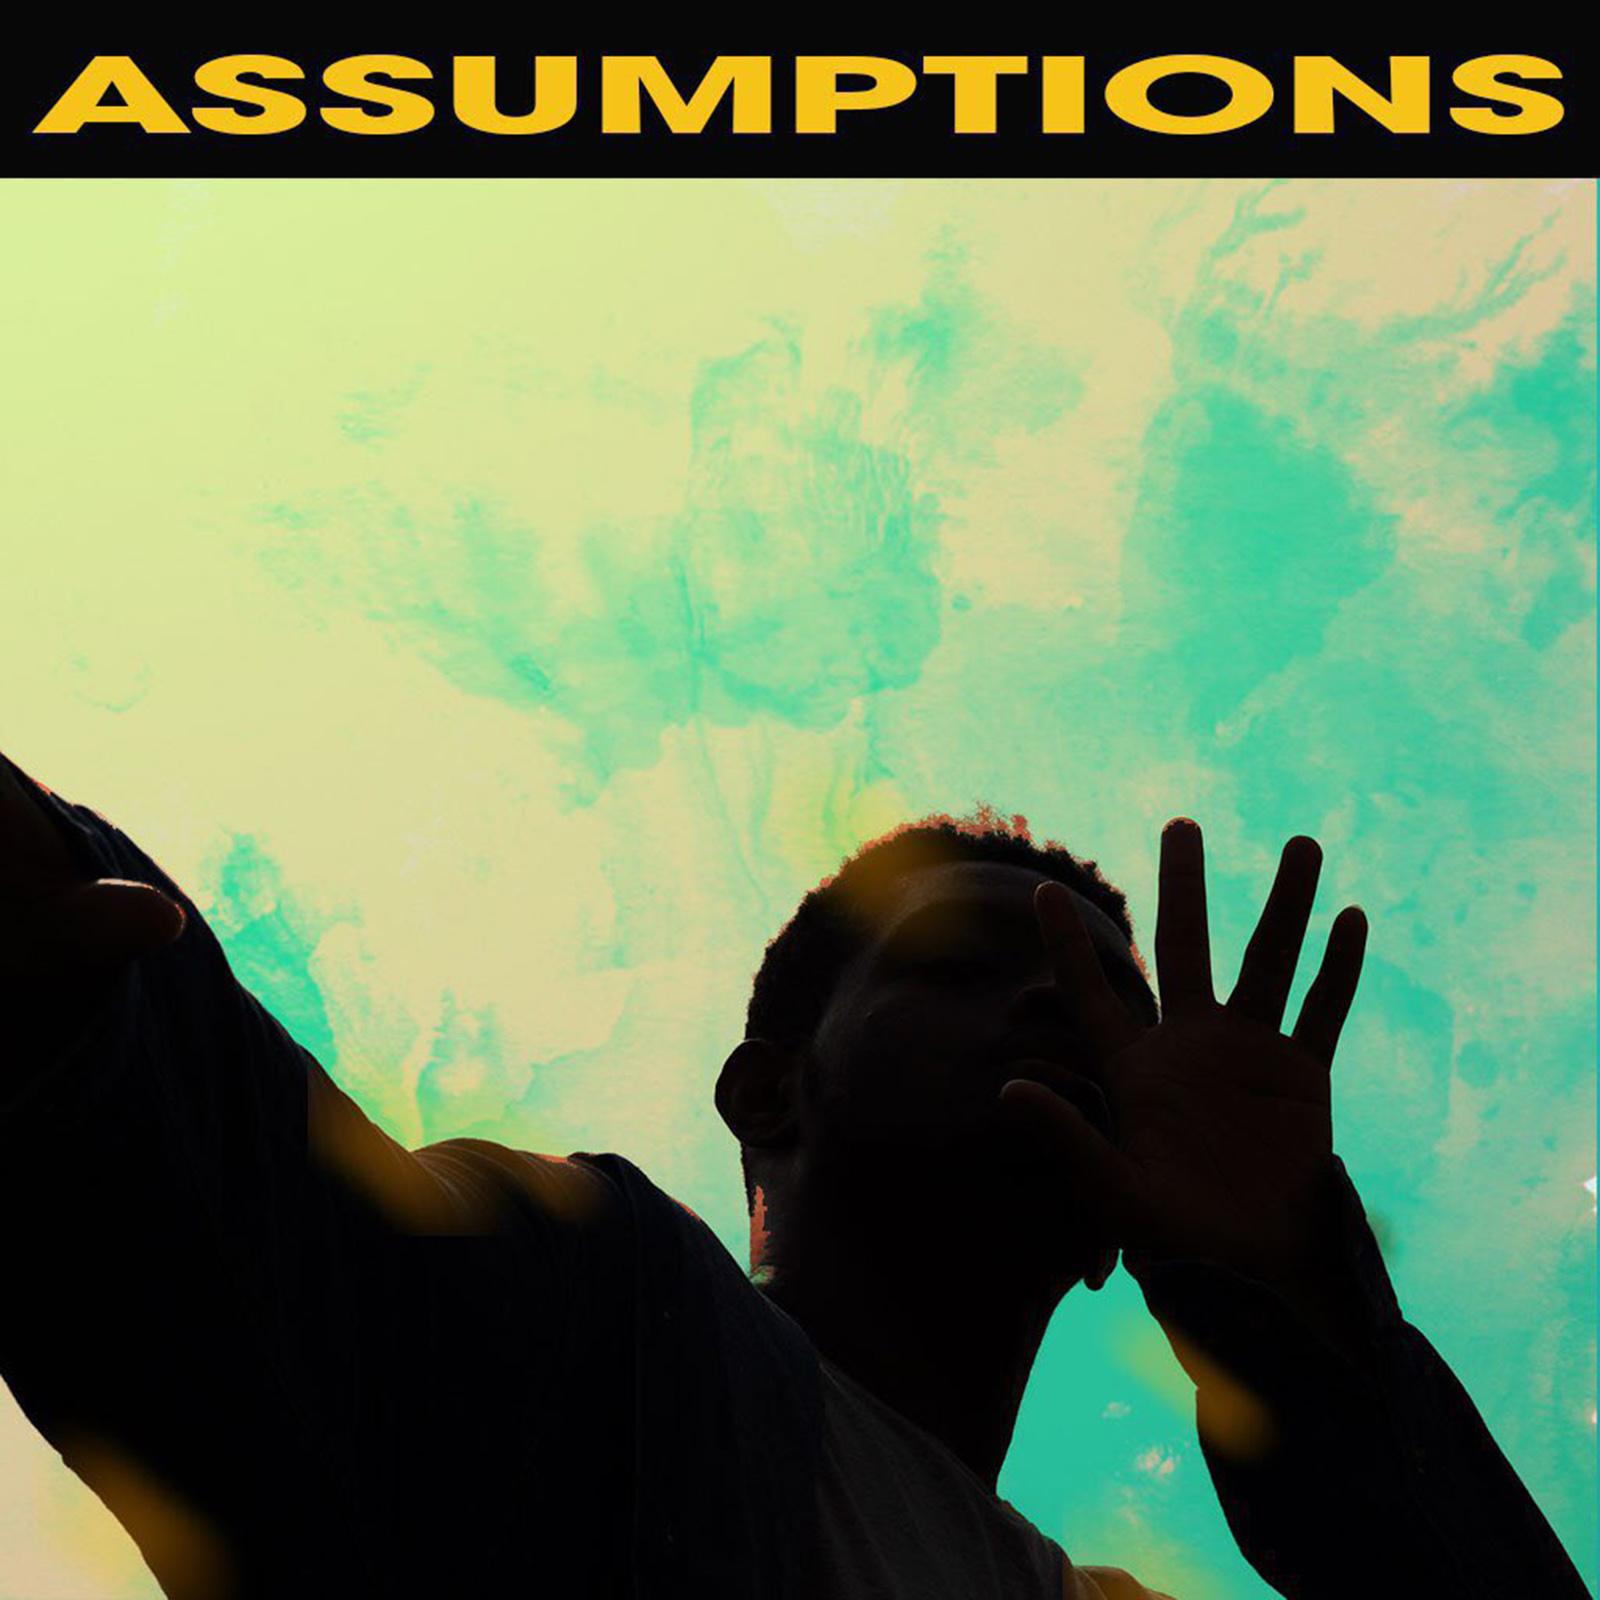 Assumptions by BRYAN THE MENSAH